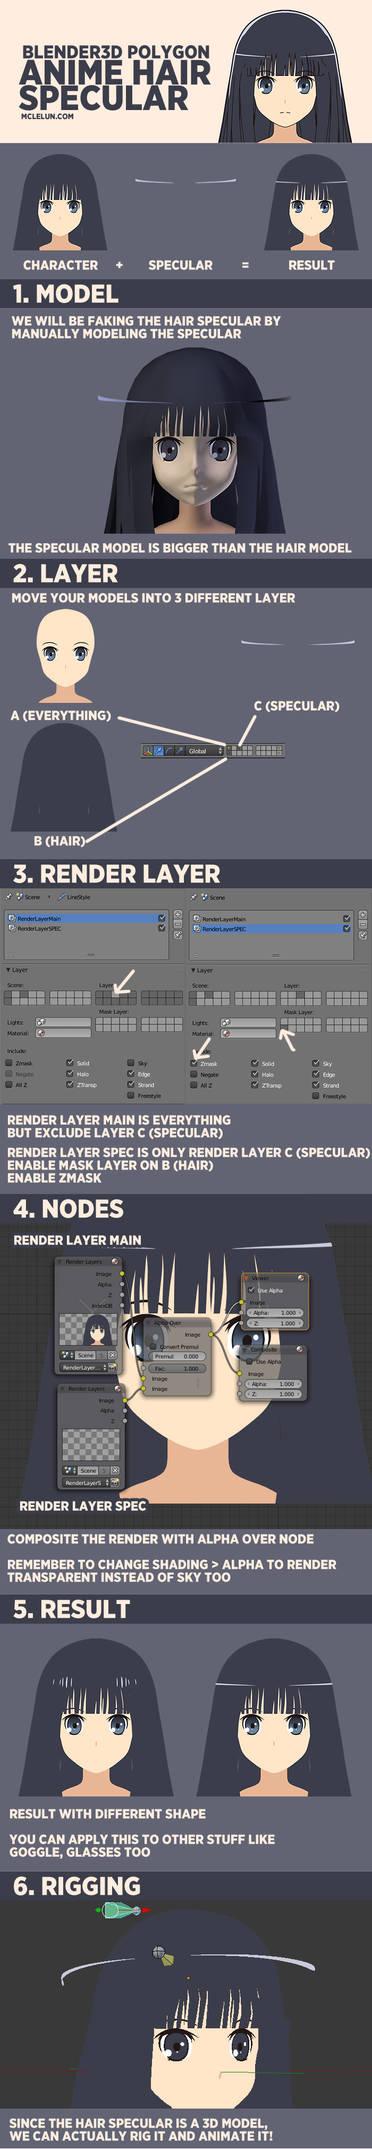 Blender3D Polygon Anime Hair Specular by mclelun